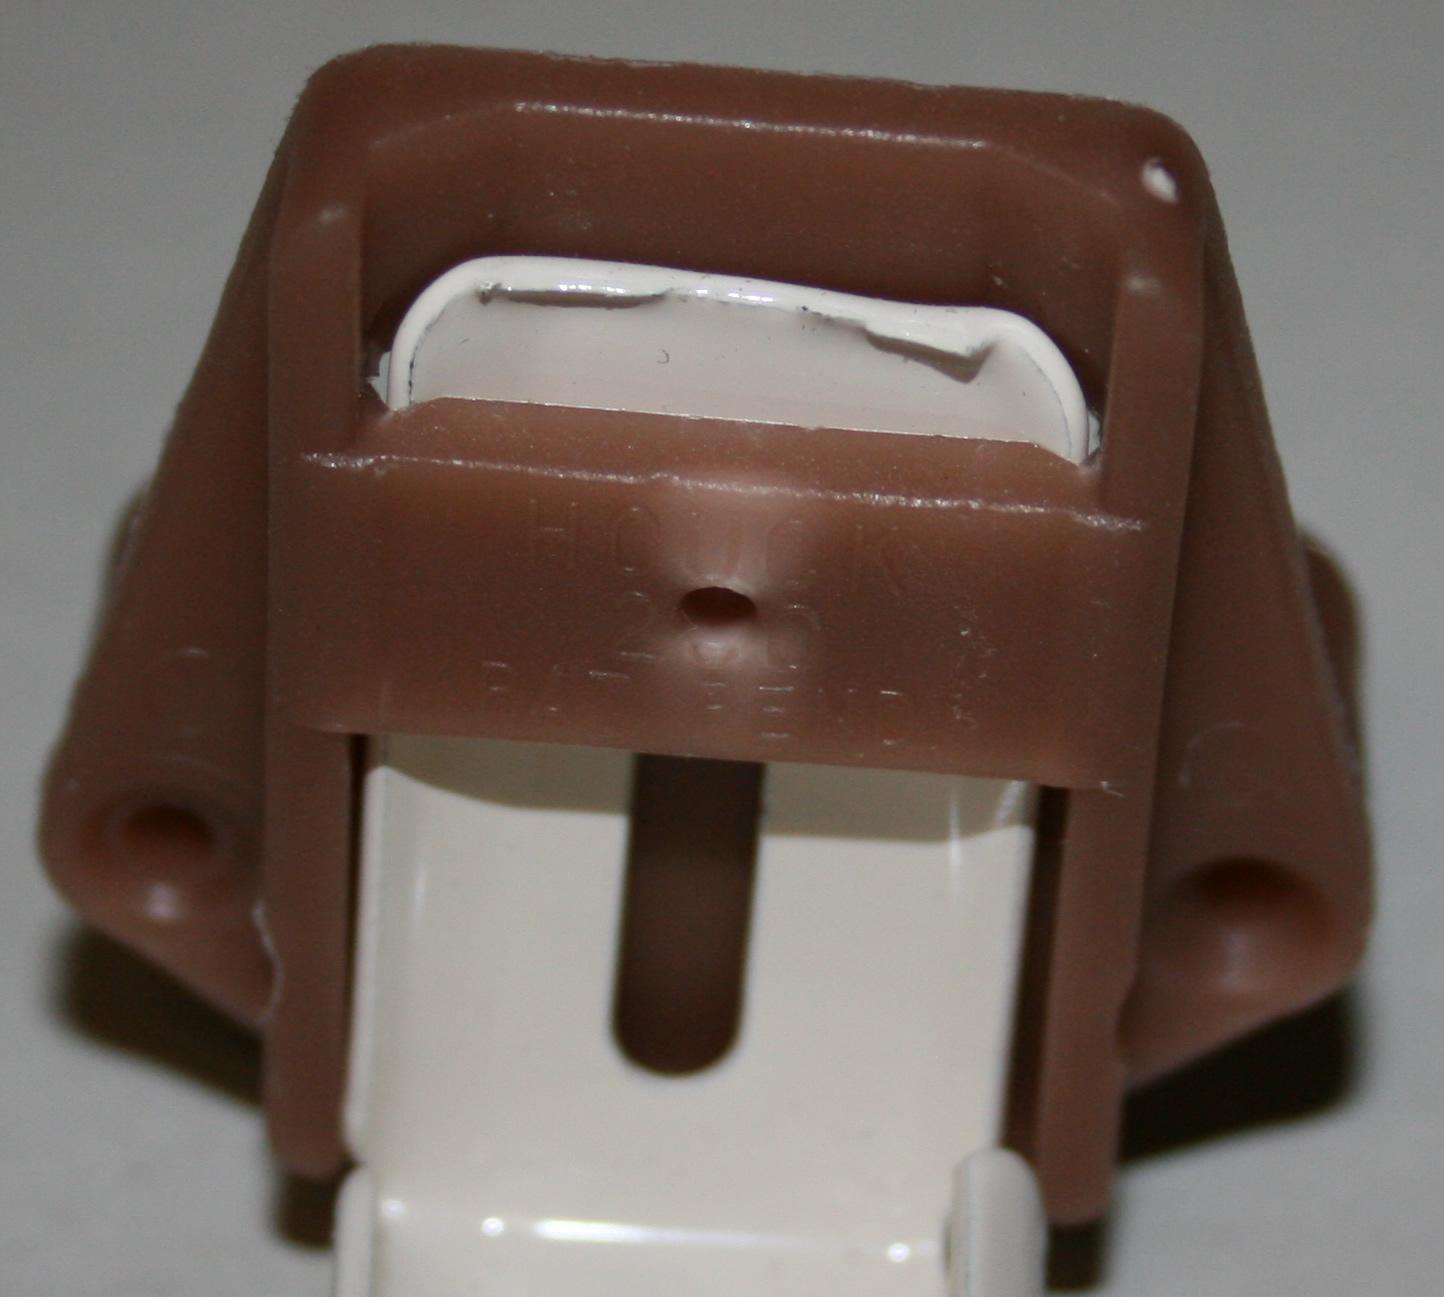 Replacement Drawer Slides >> Houck Industries Brackets, Boots, Sockets